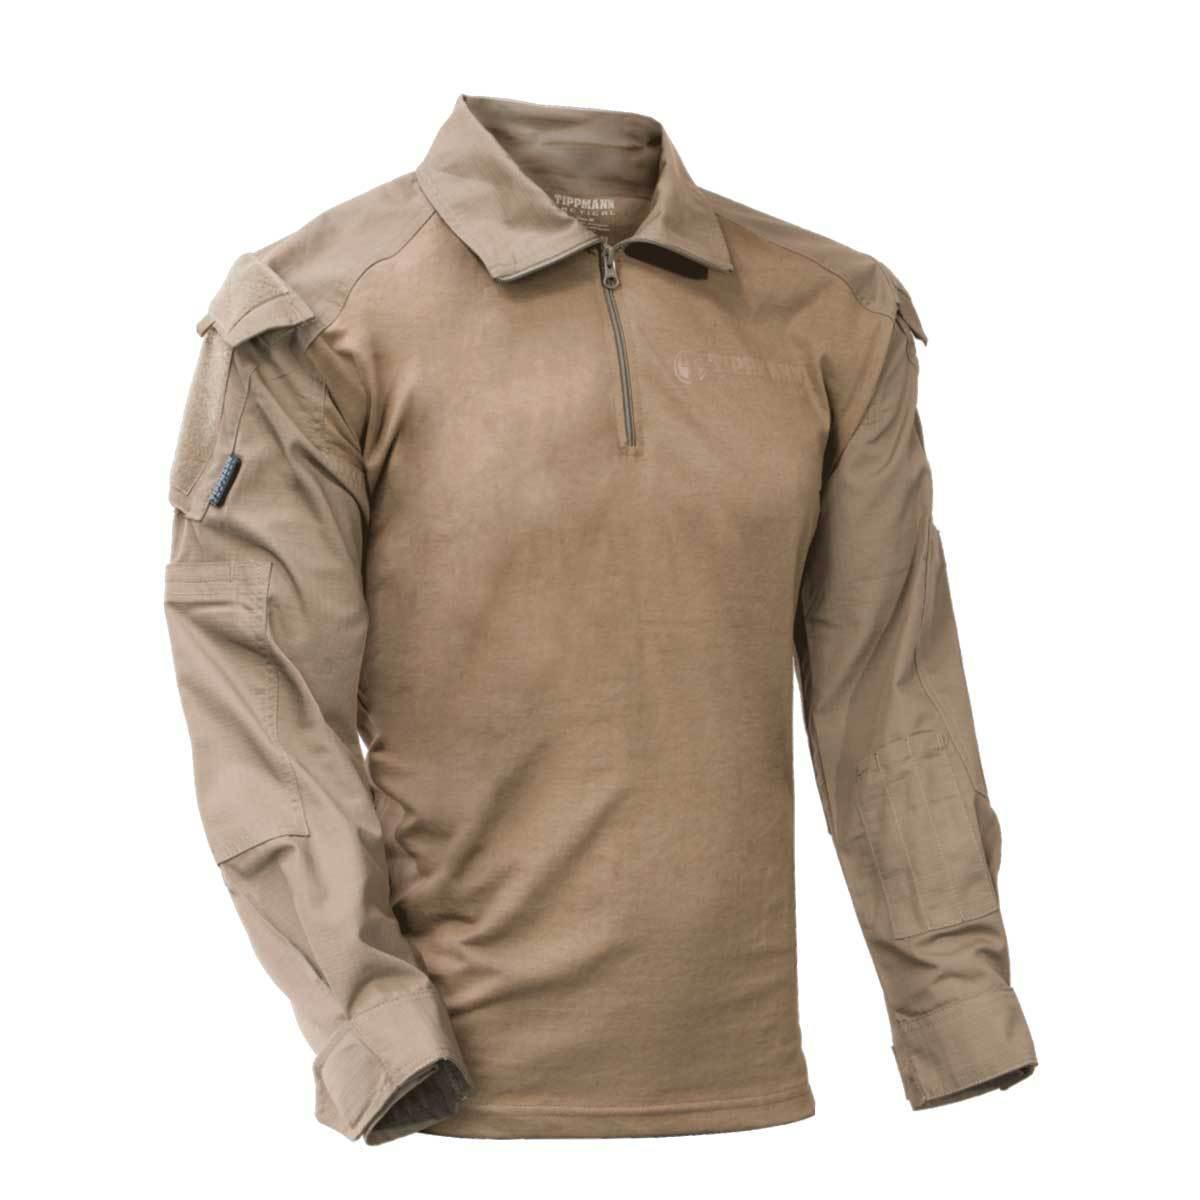 Tippmann Tactical TDU Shirt - Tan - - - Medium 87937e